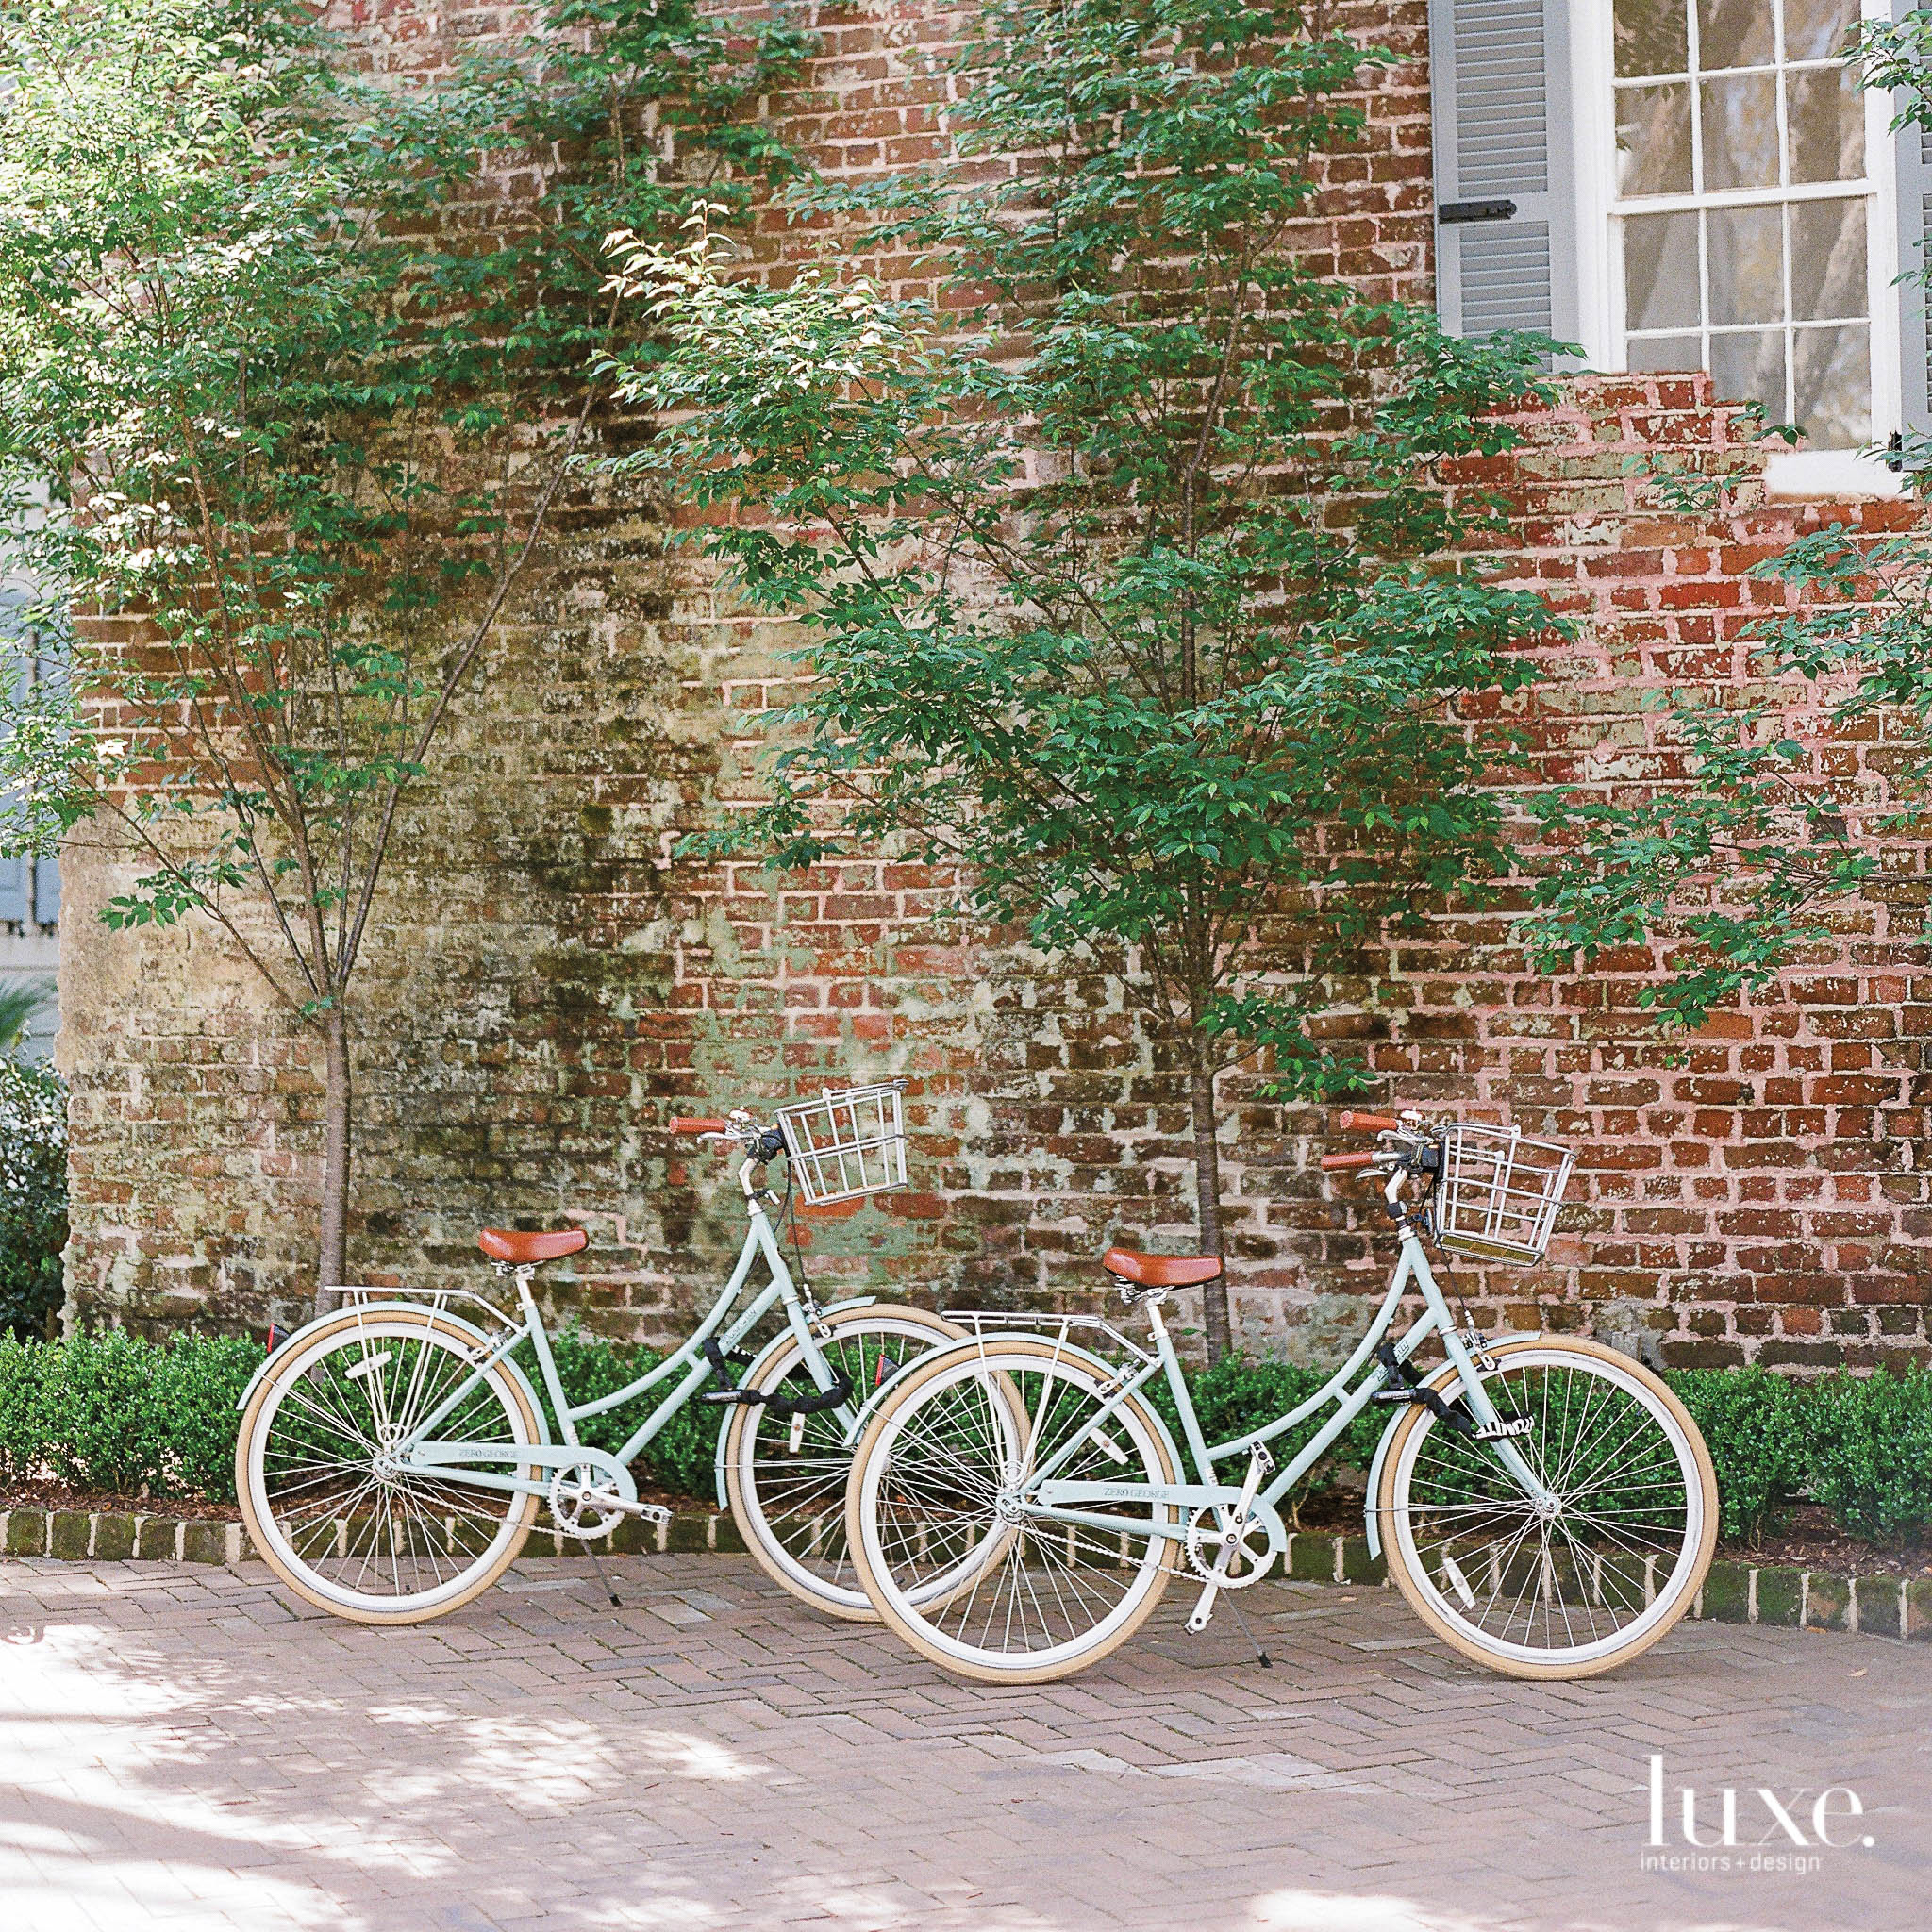 Bikes at Zero George